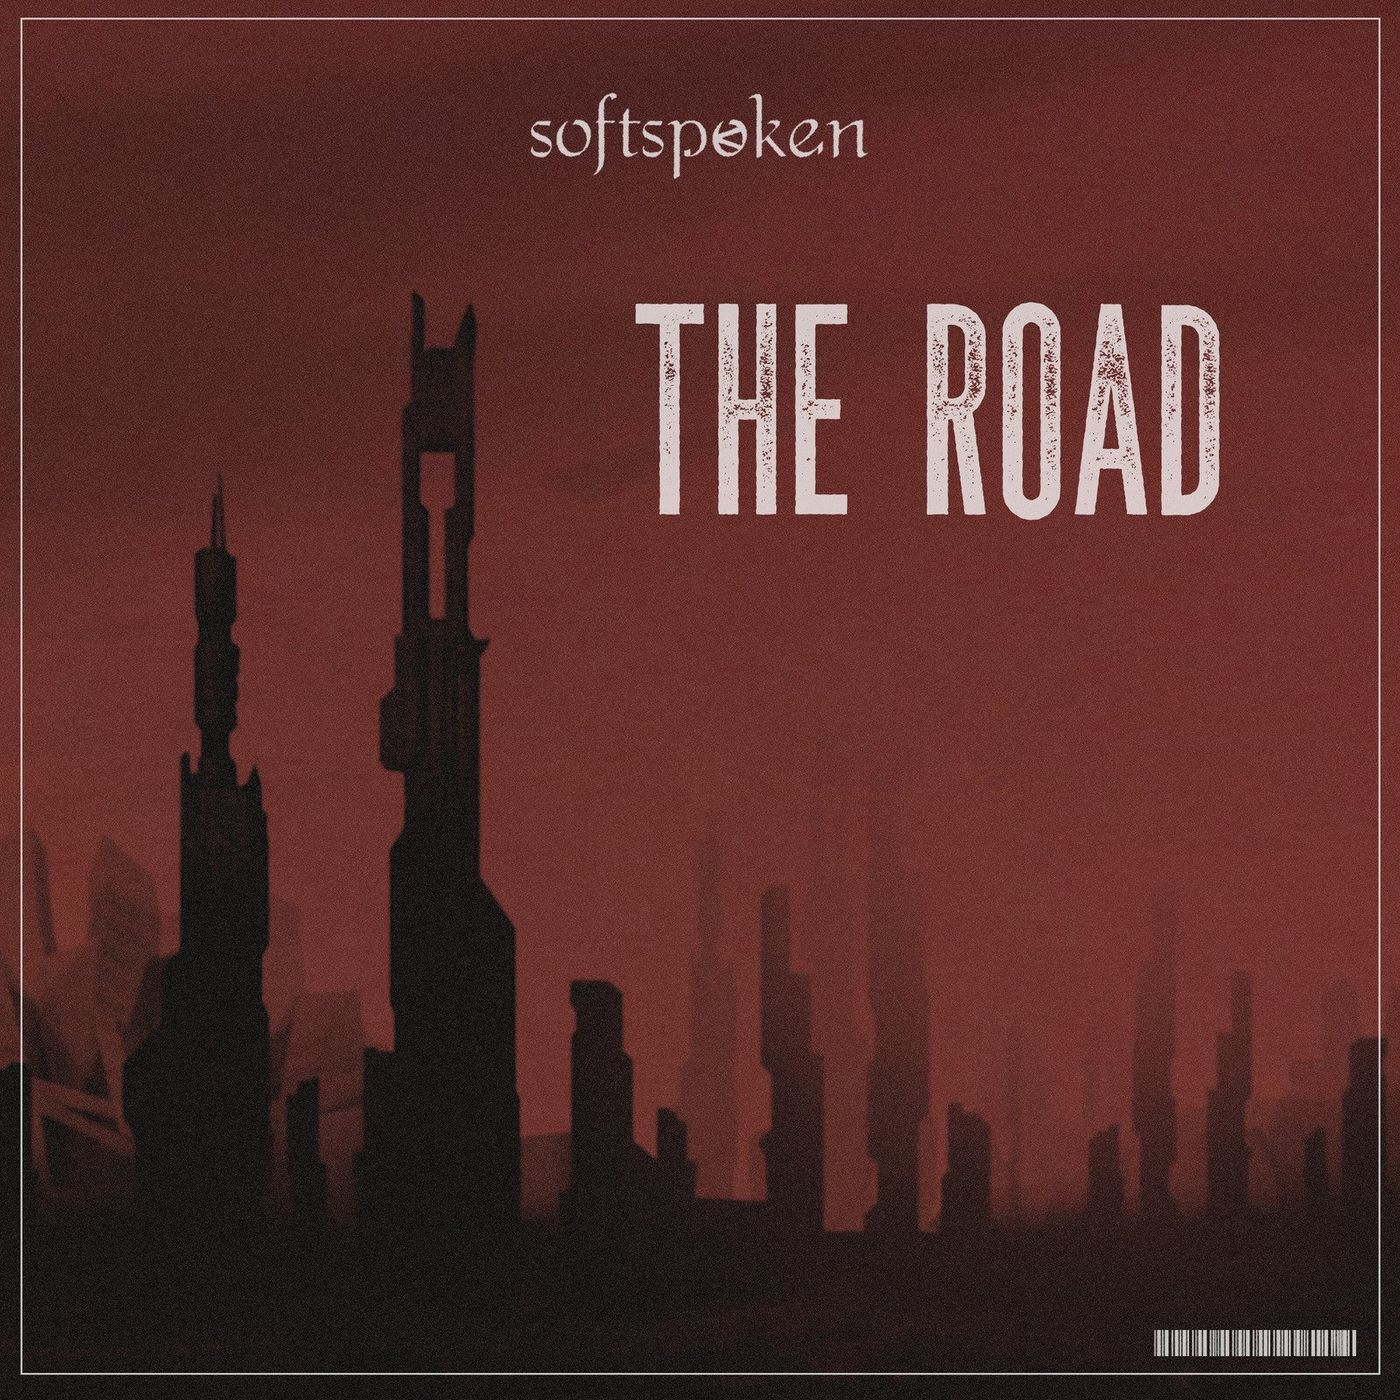 Softspoken - The Road [single] (2021)